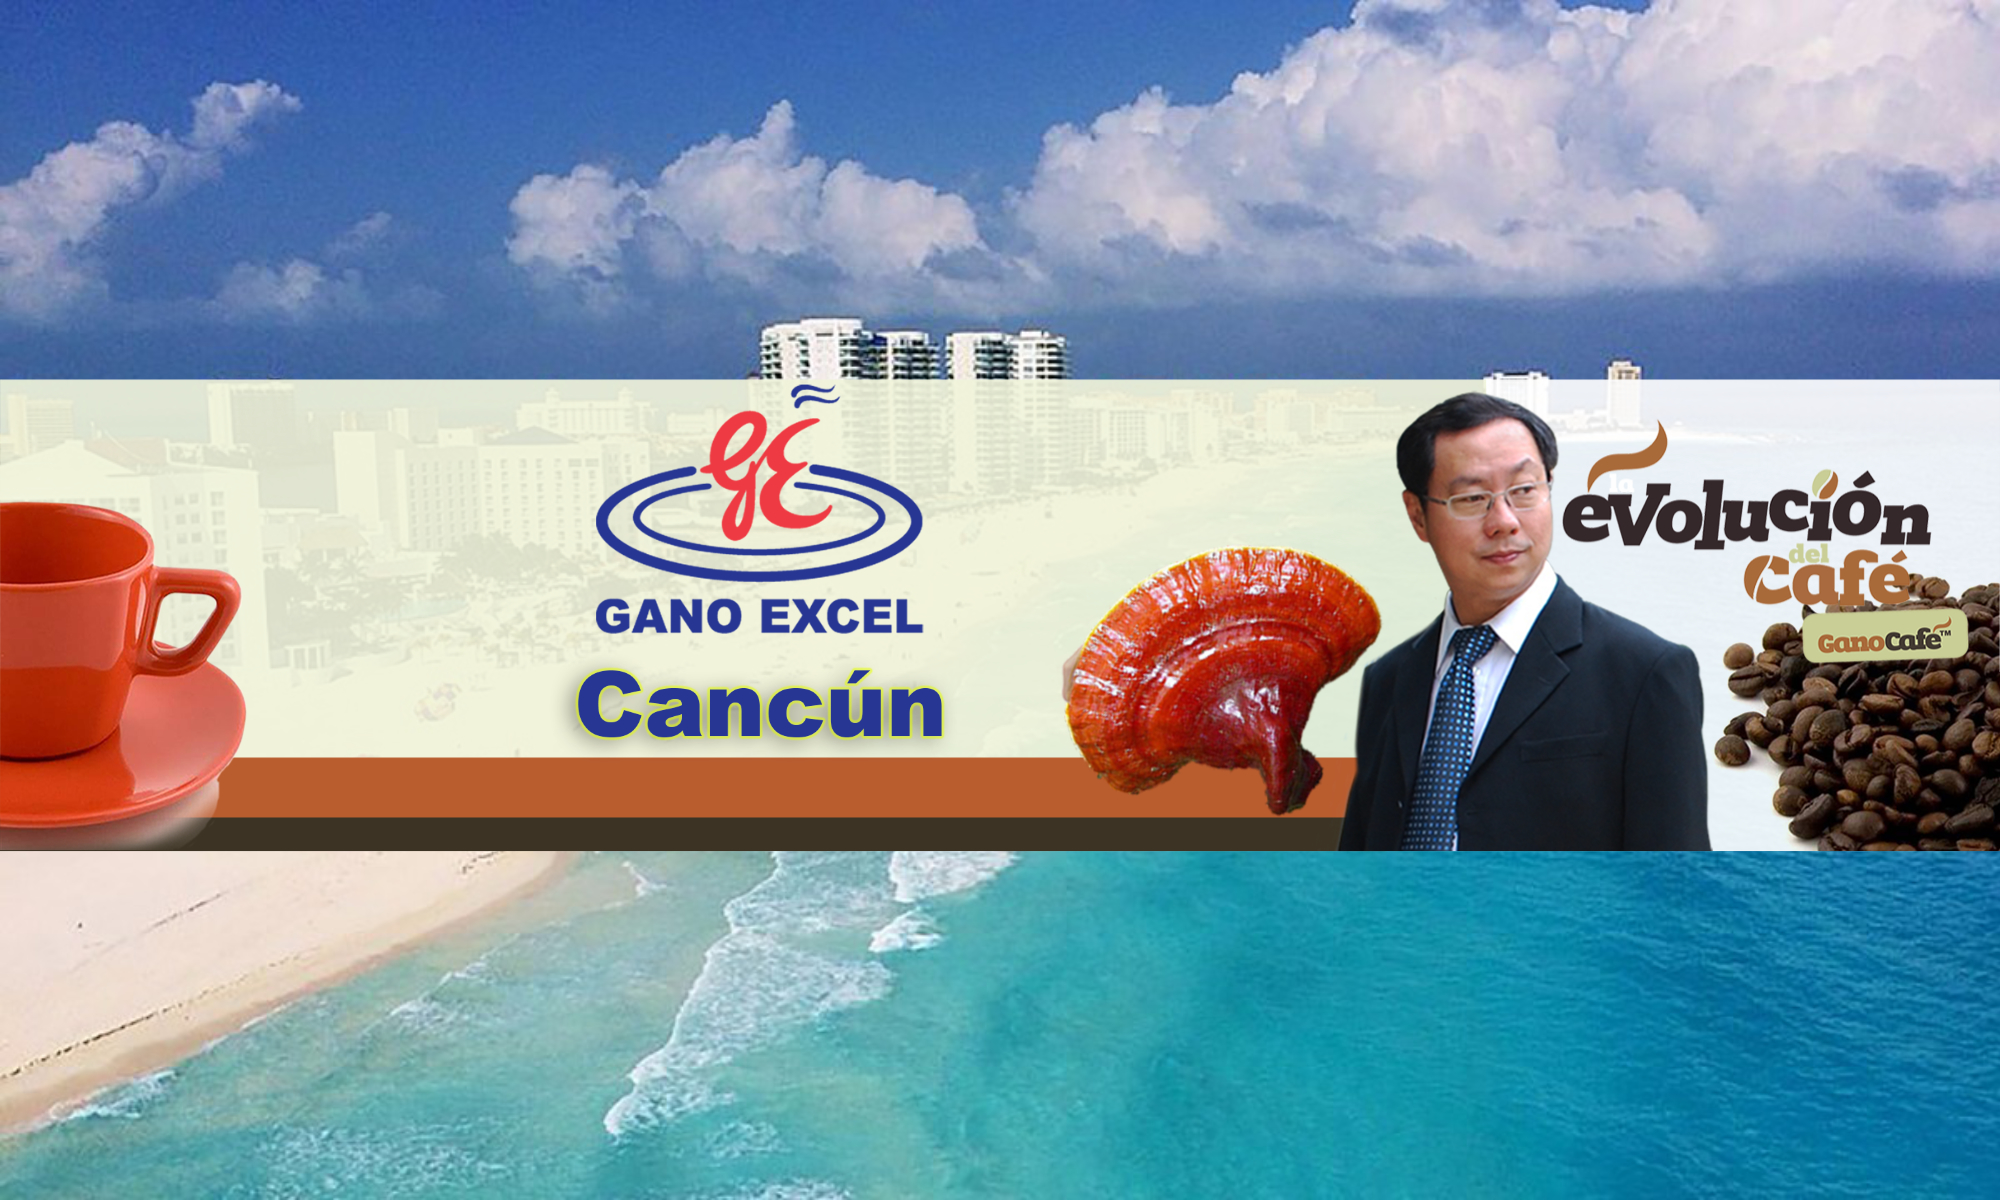 Gano Excel Cancun